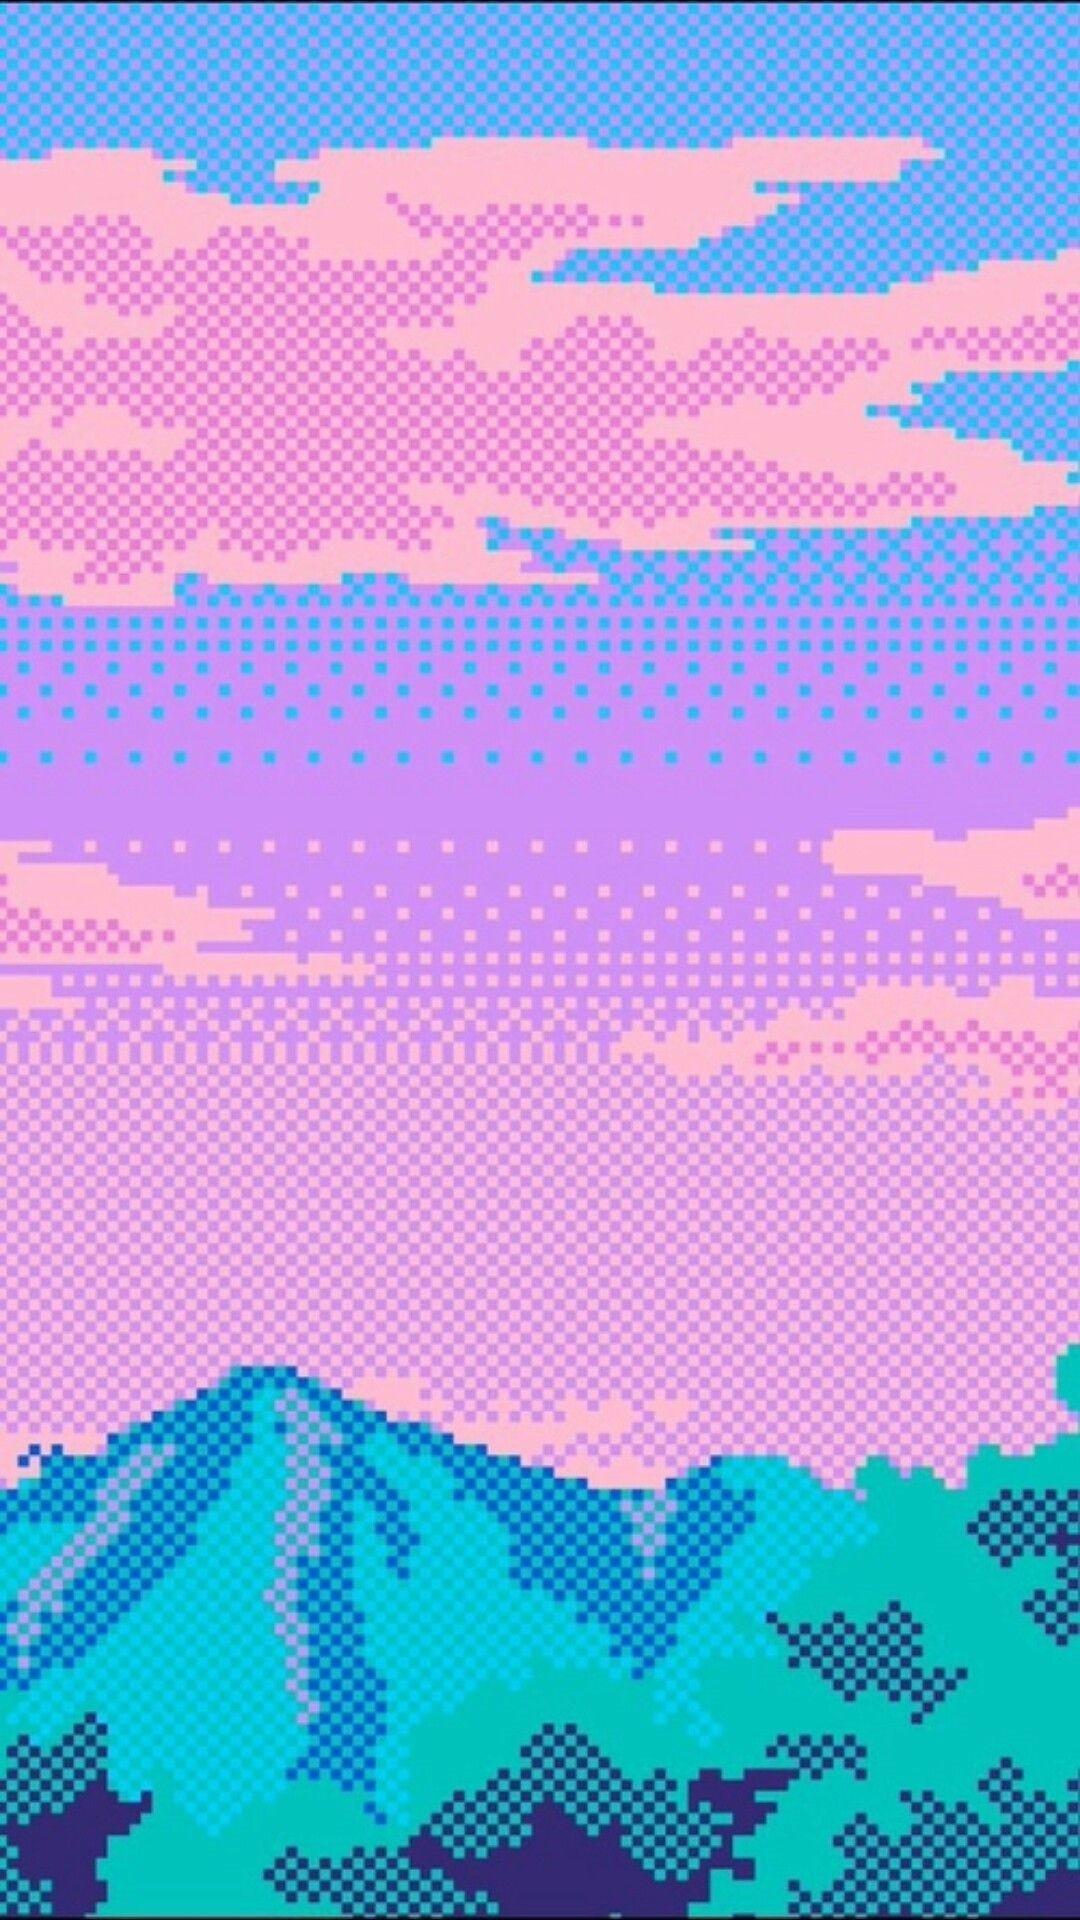 Vaporwave phone wallpaper